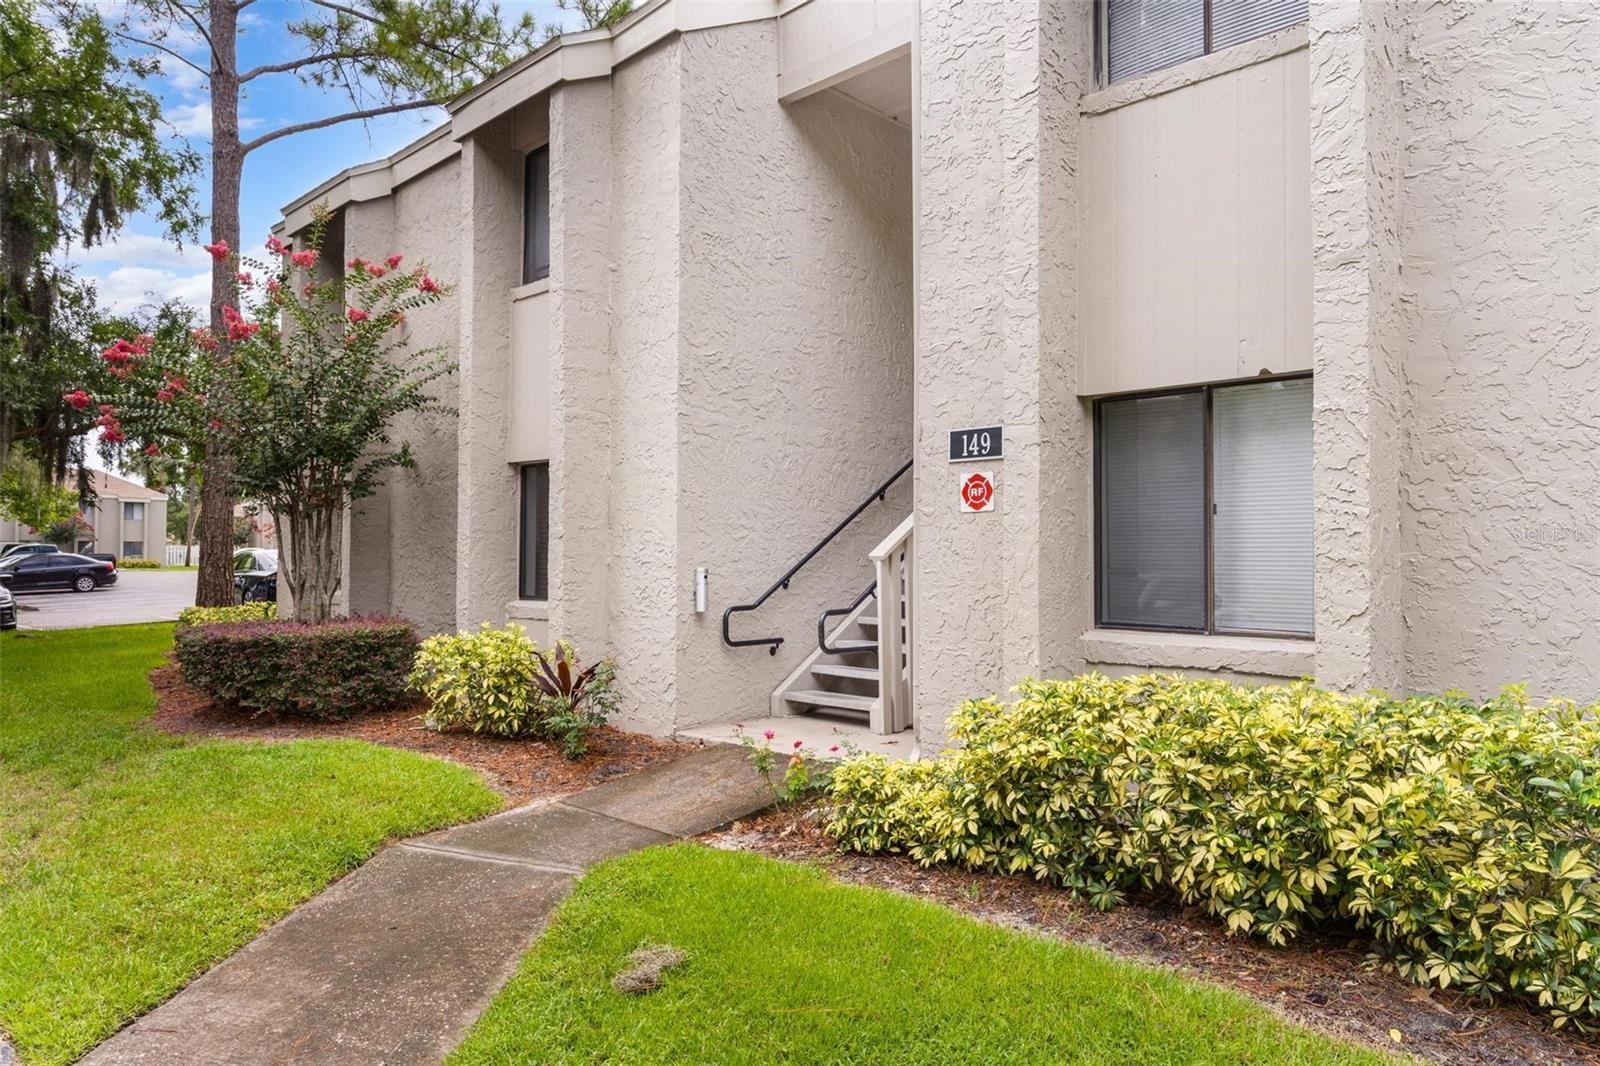 149 SPRINGWOOD CIRCLE #D, Longwood, FL 32750 - MLS#: O5957168